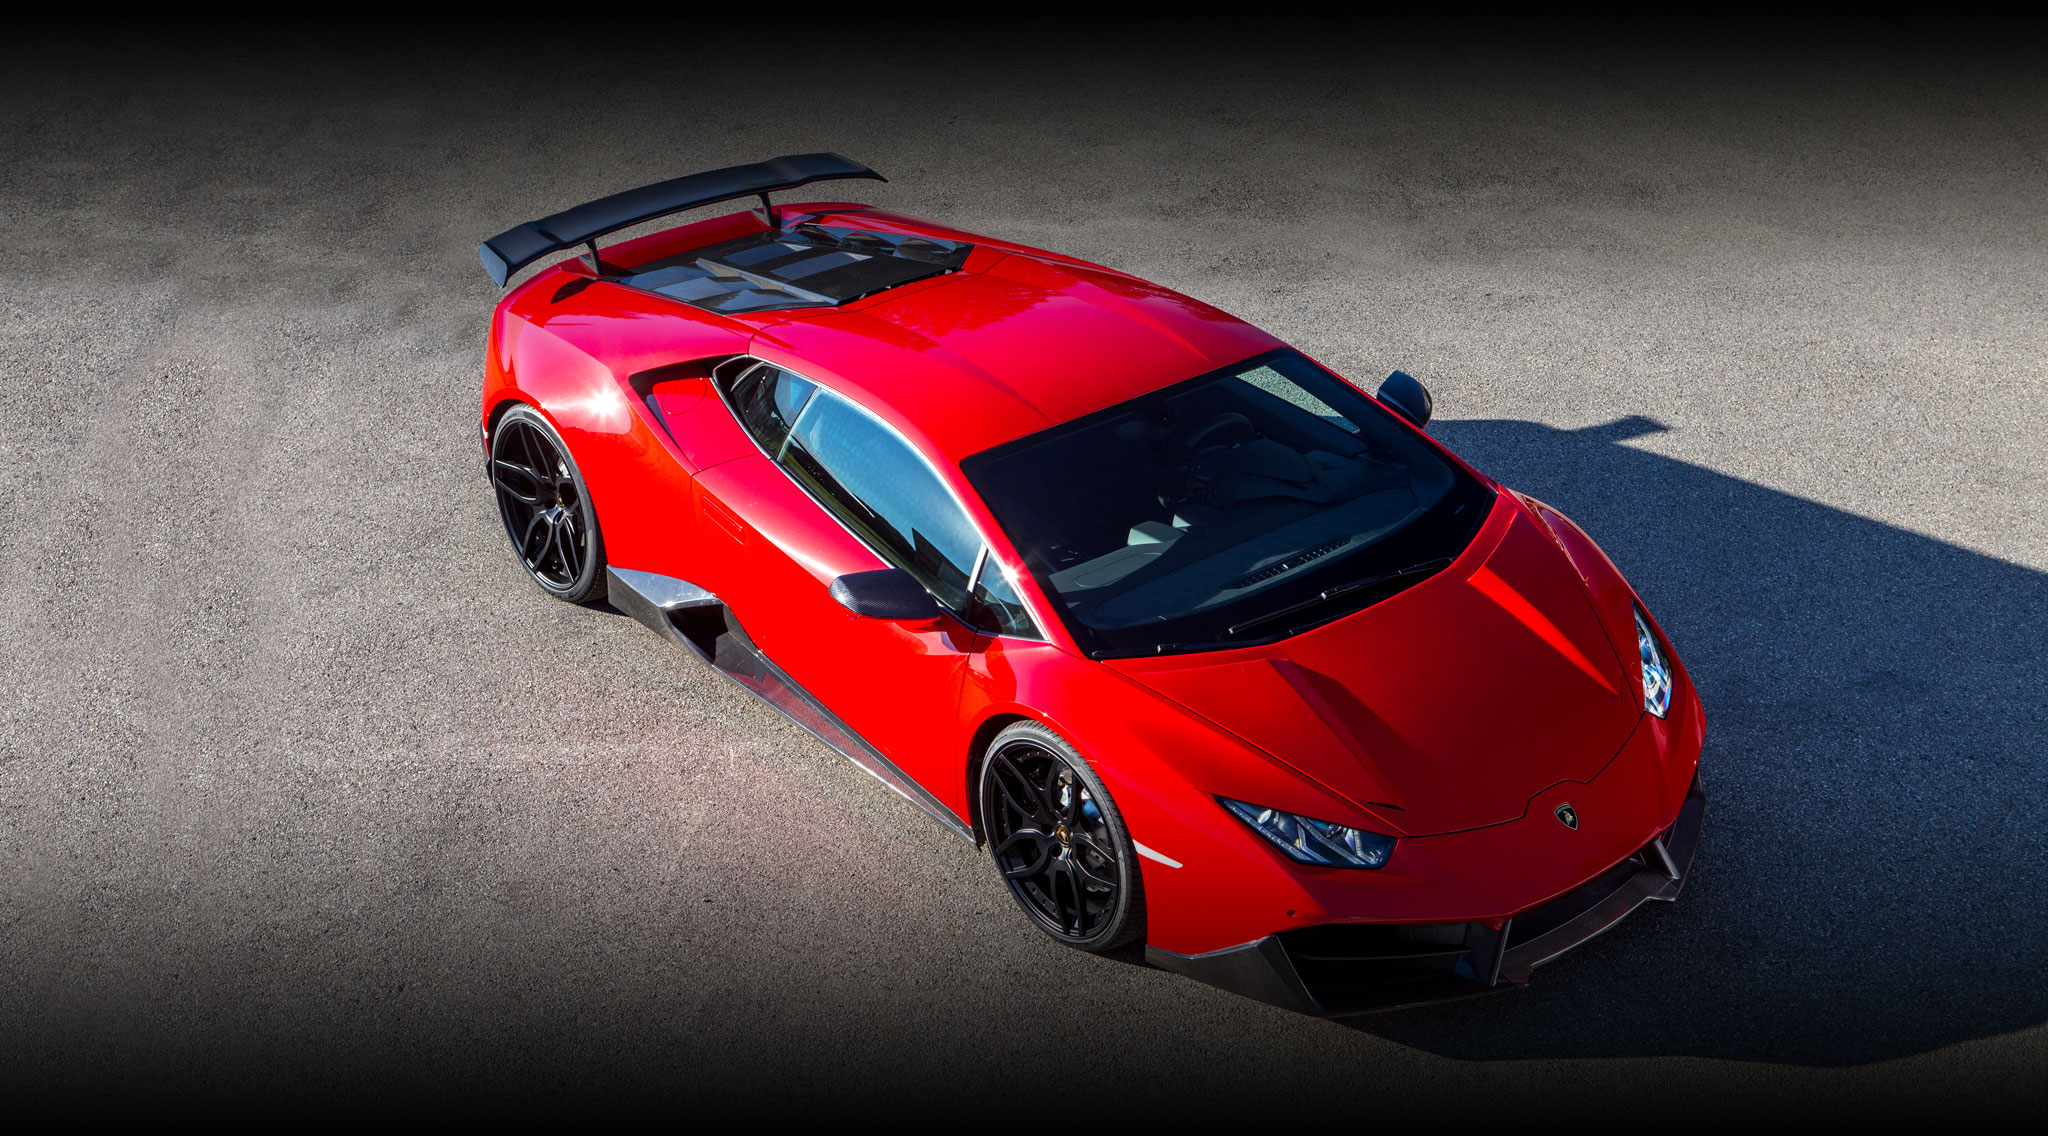 Novitec picture gallery Lamborghini Huracn Coupe RWD 2048x1136